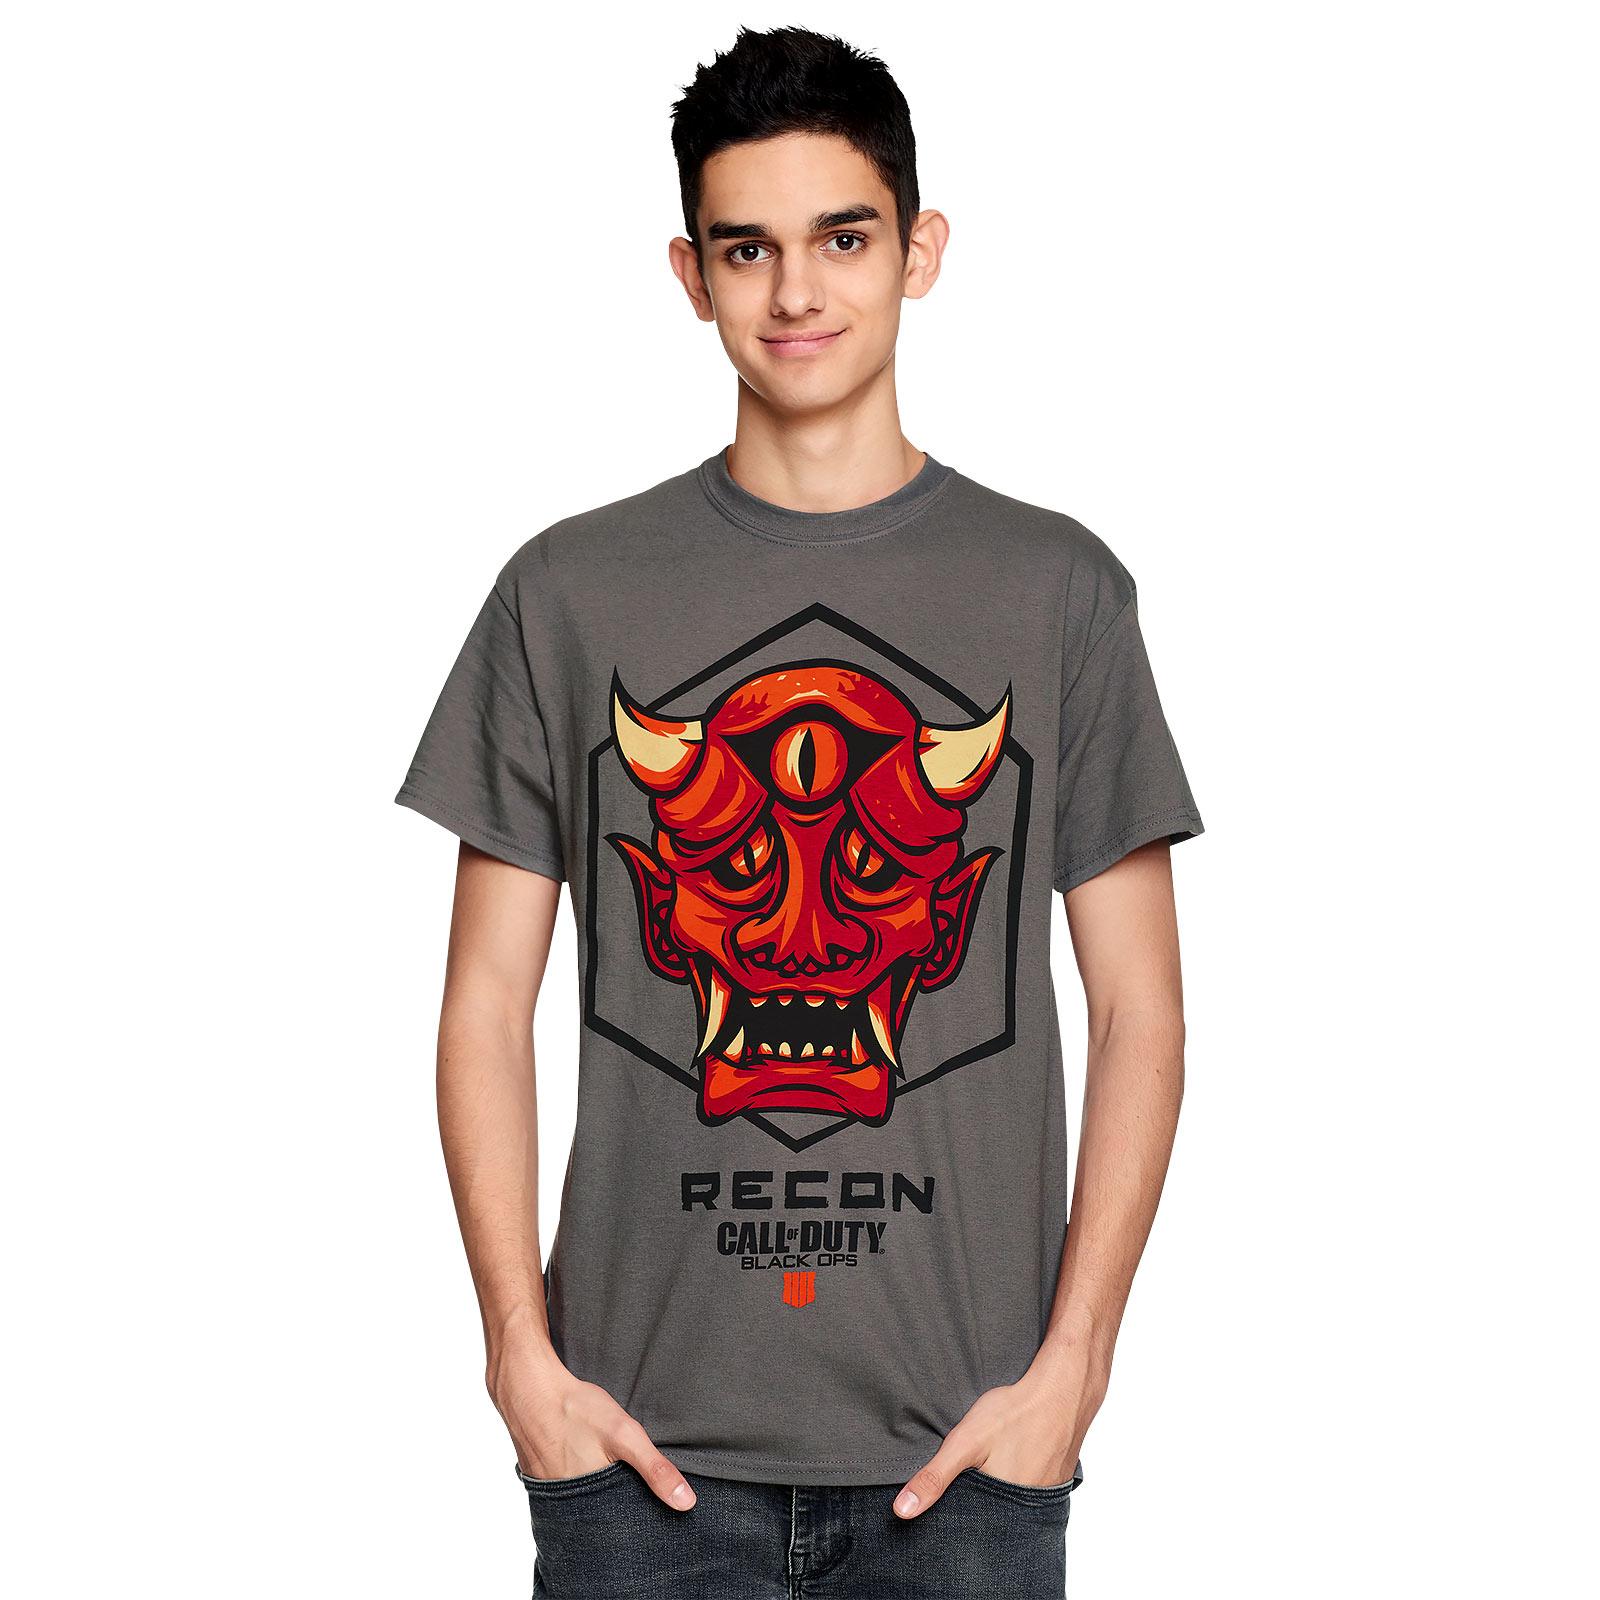 Call of Duty - Recon Badge T-Shirt grau